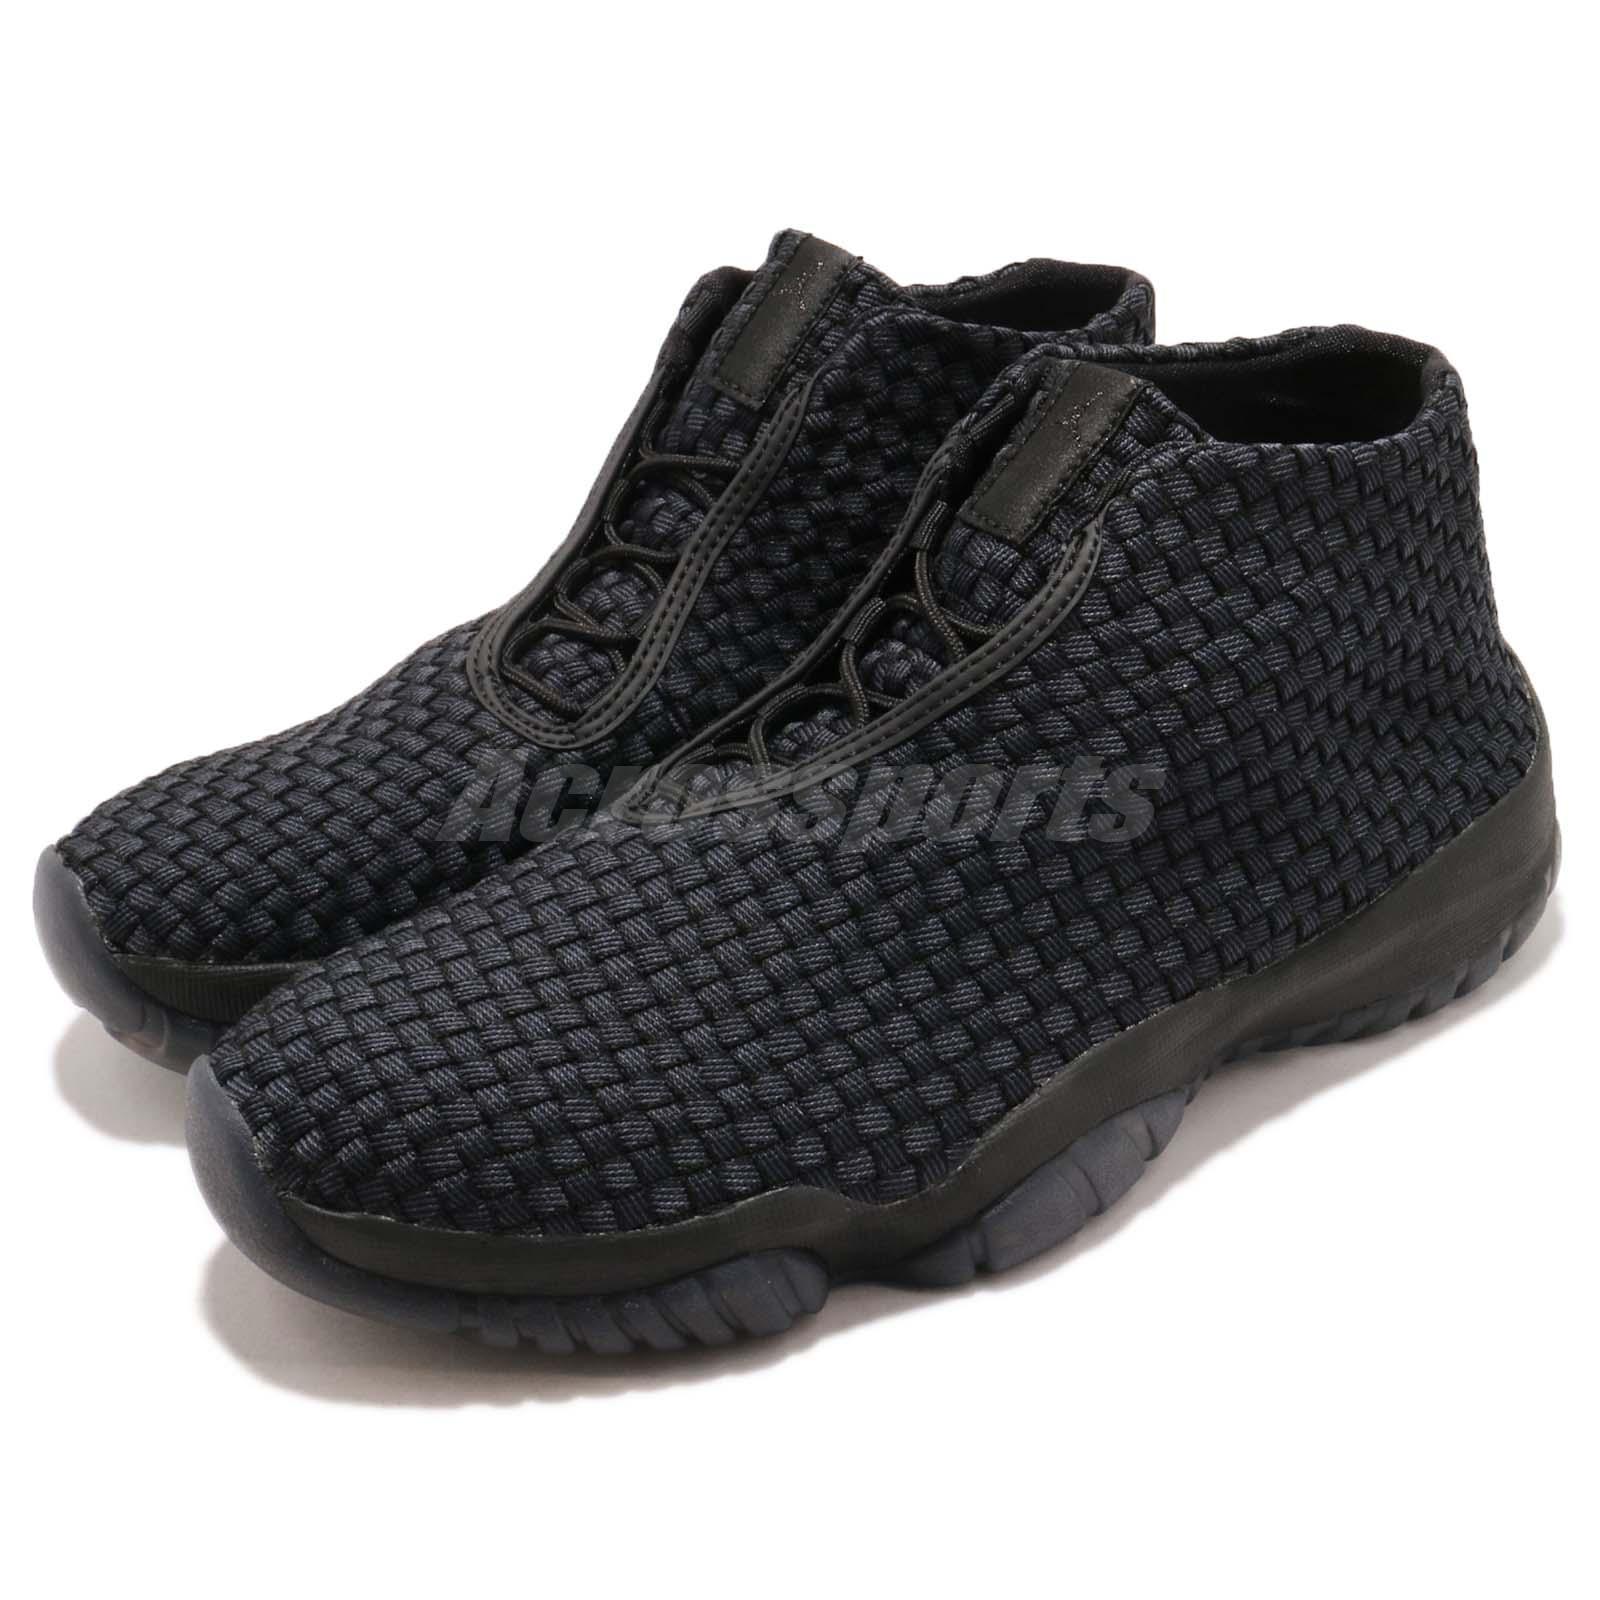 Details about Nike Air Jordan Future Black Anthracite Men Casual Shoes  Sneakers 656503-001 d67265d9f